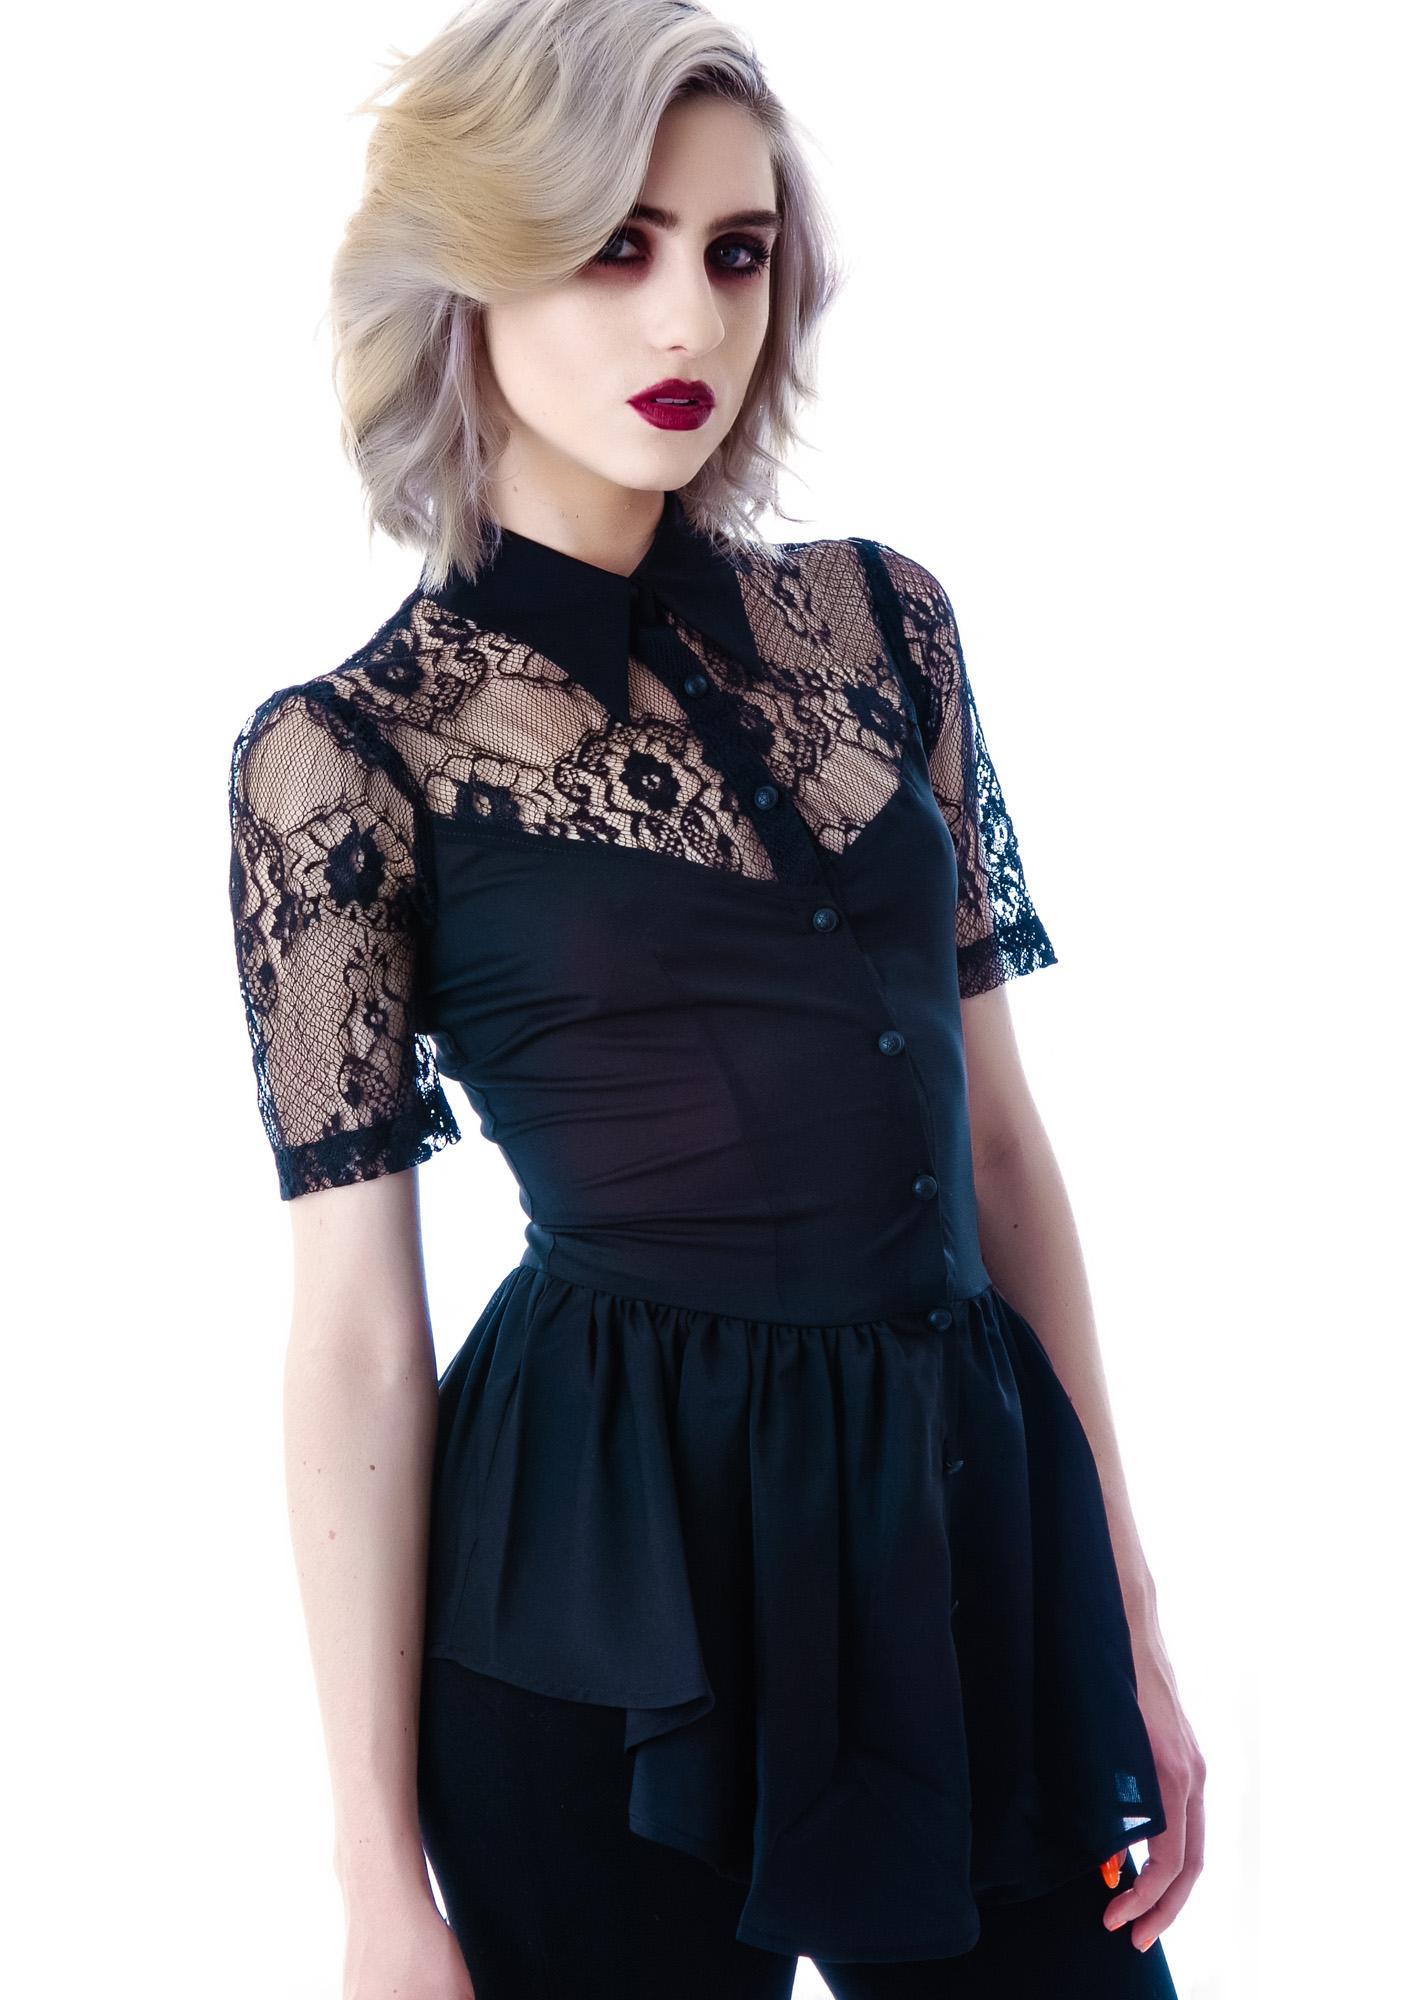 Lip Service Black Steam Lace Cap Sleeve Top